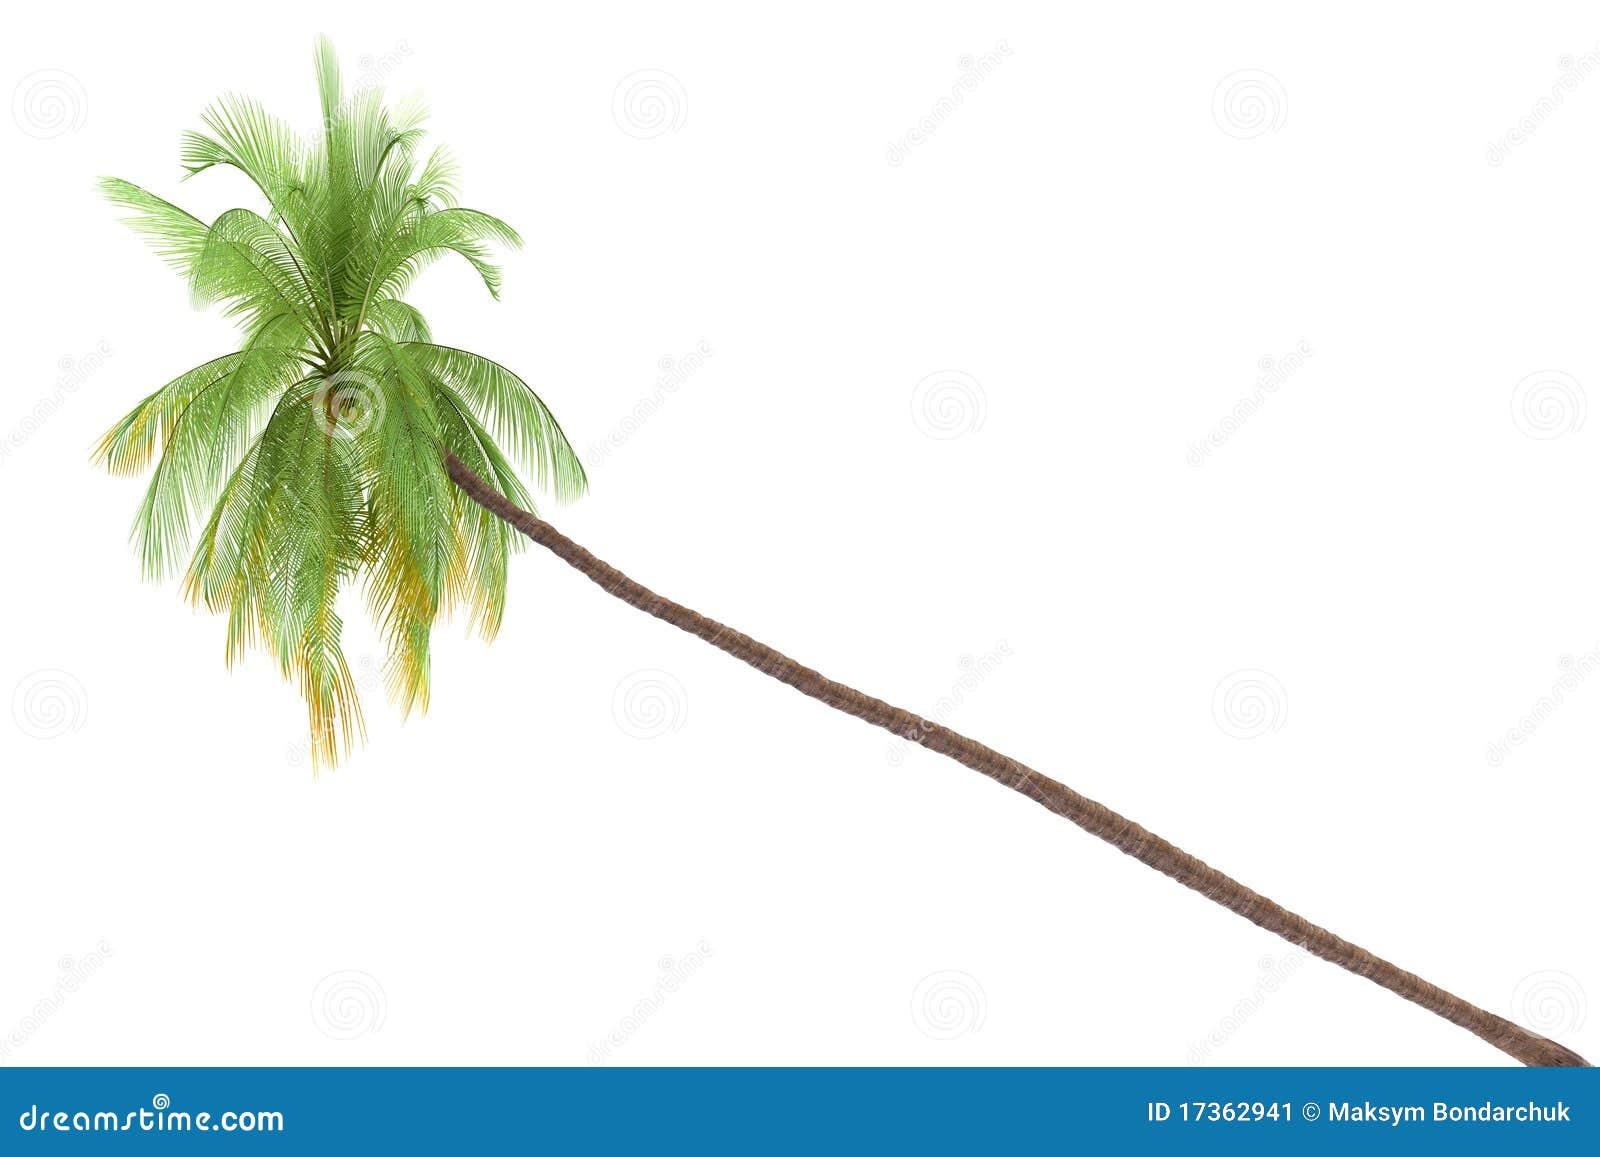 palm tree white - photo #38